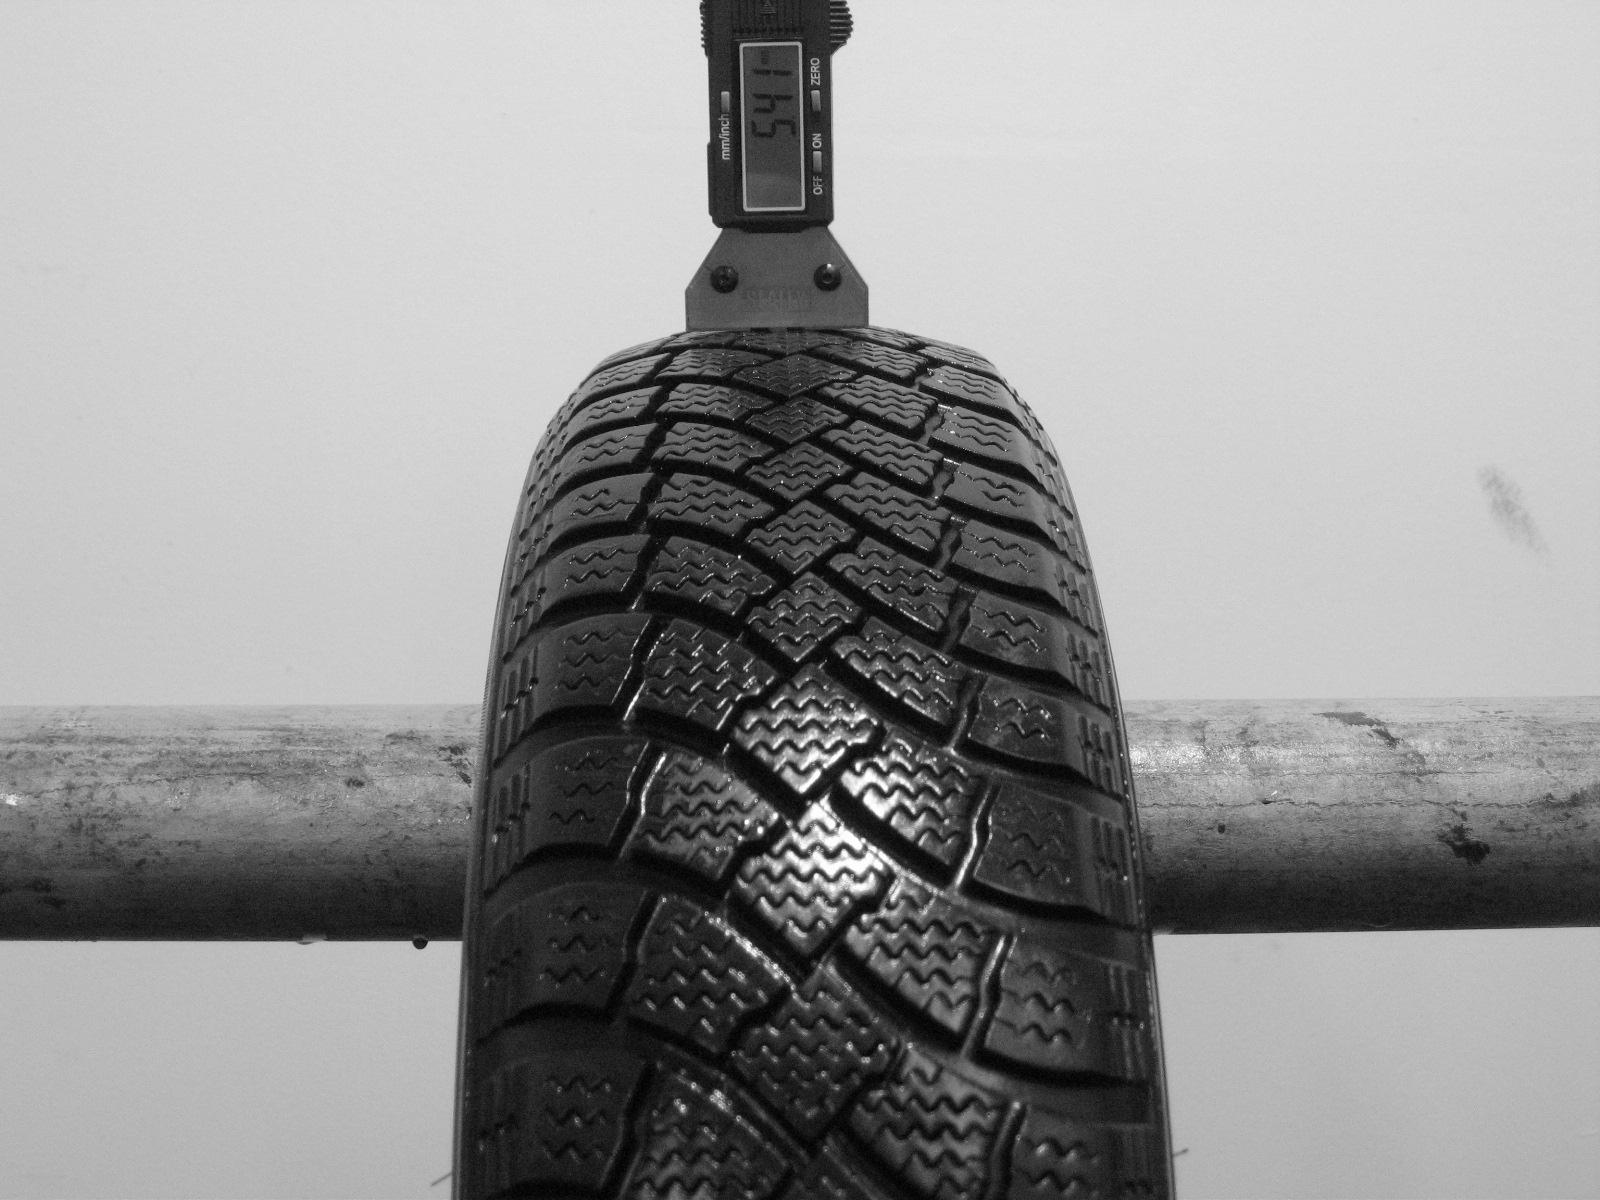 Použité-Pneu-Bazar - 135/70 R15 CONTINENTAL CONTIWINTERCONTACT TS760-kusovka-rezerva 3mm